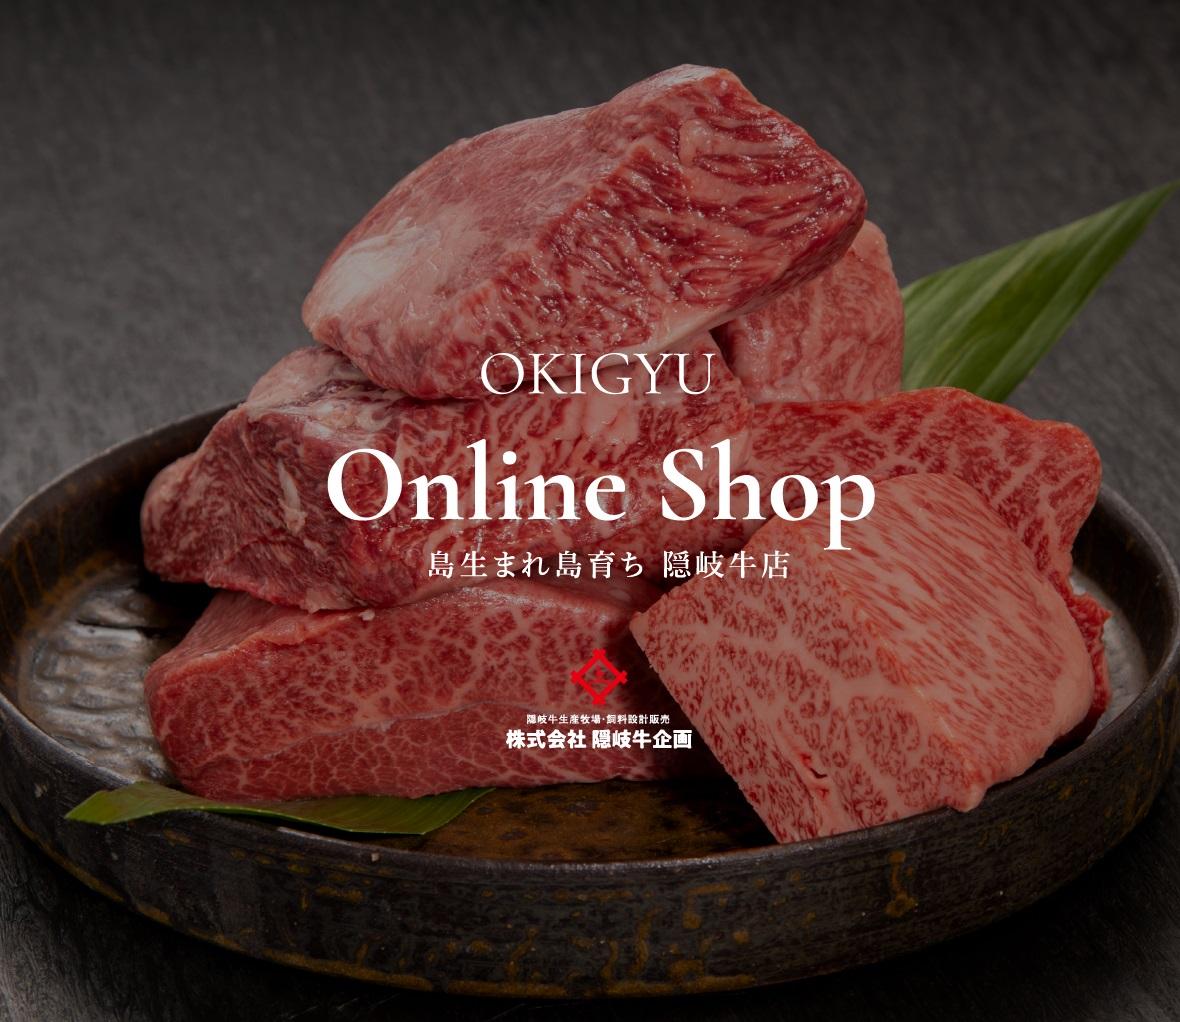 OKIGYU Online Shop